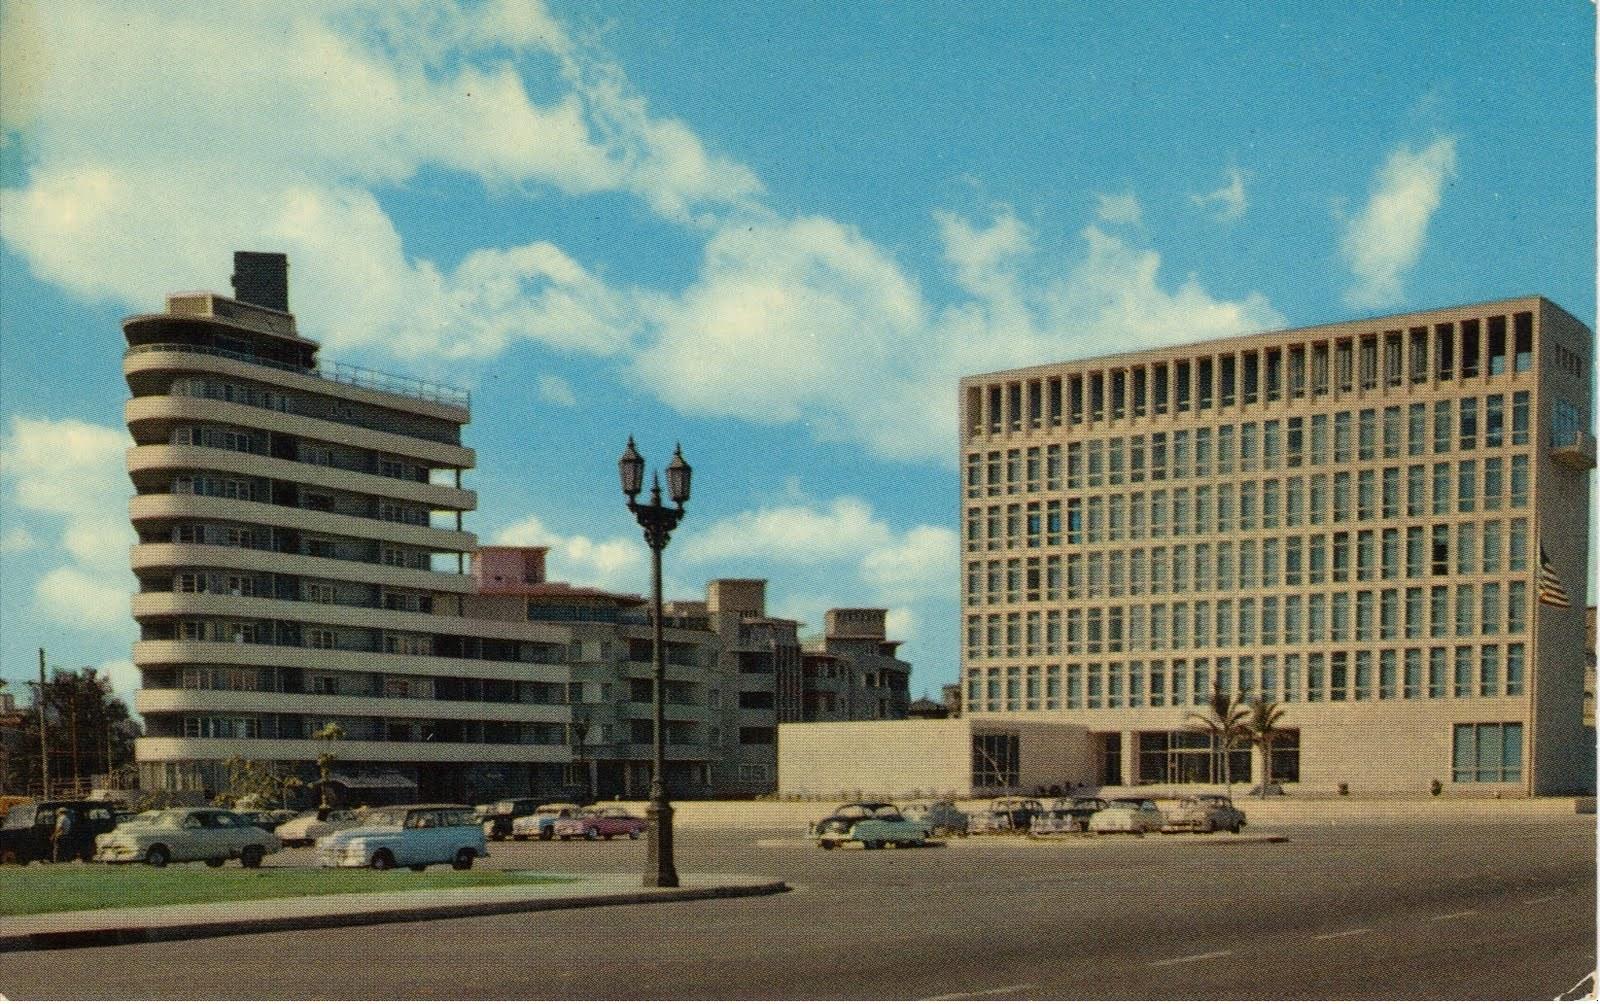 United States Embassy in Vedado, 1955